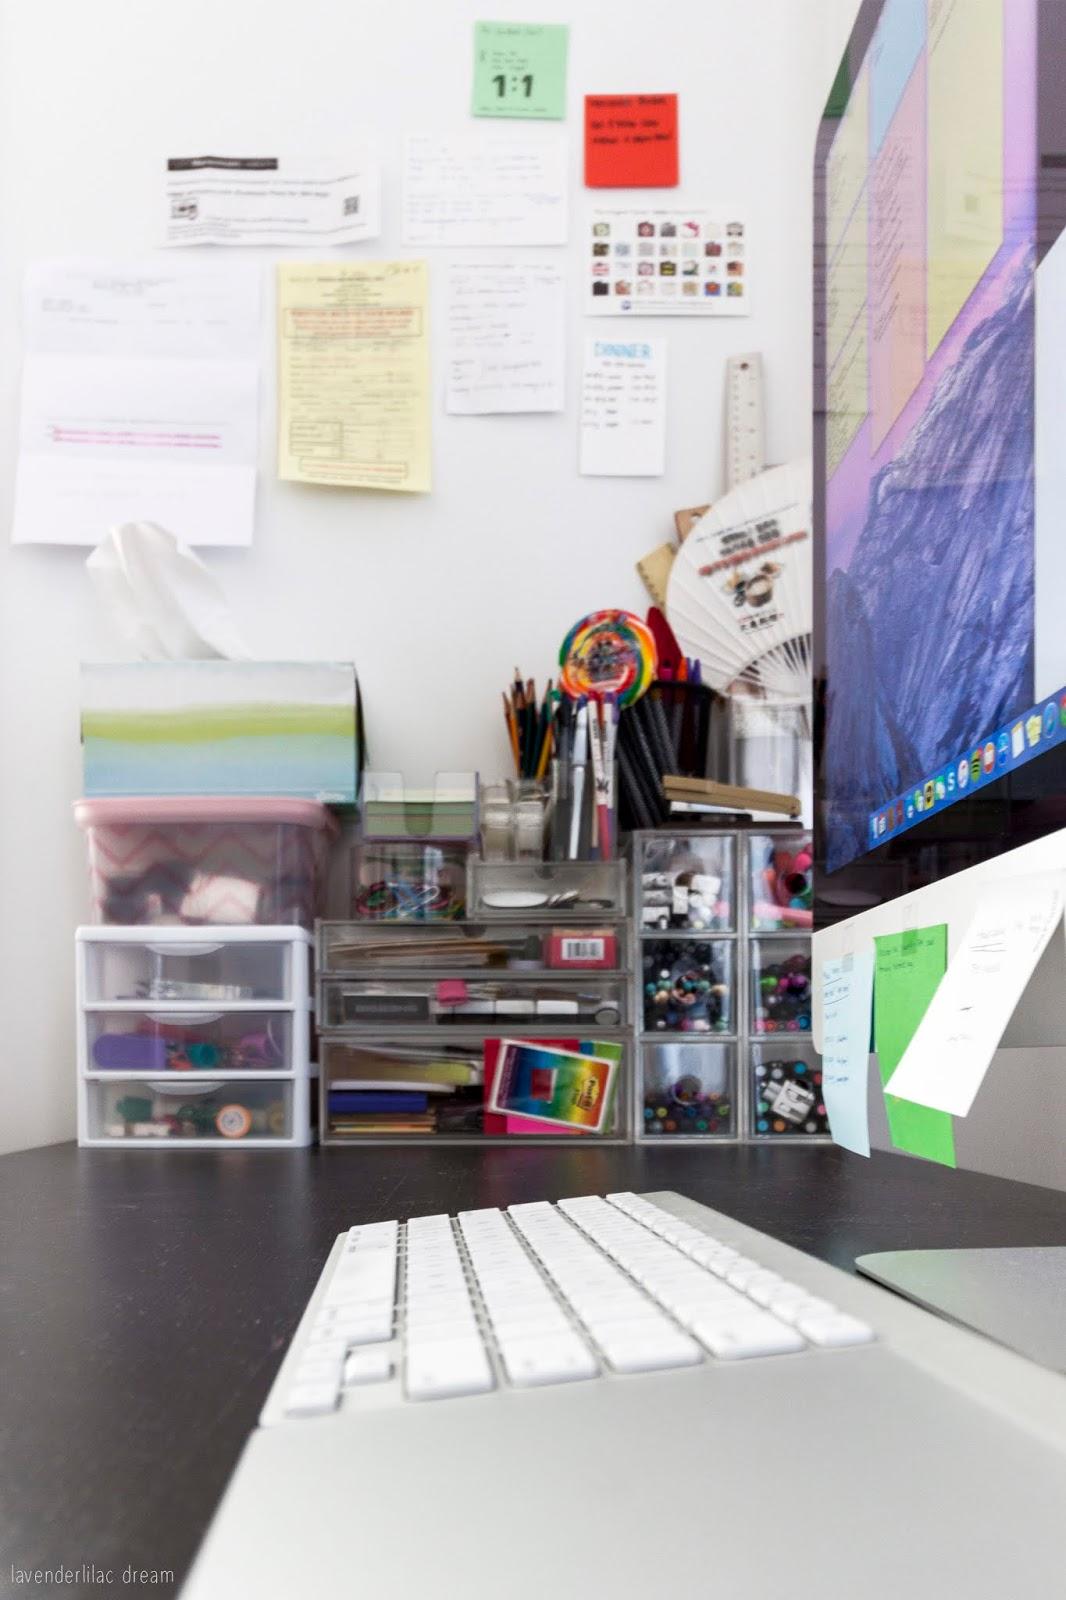 Inspiration & Notes wall, Muji acrylic drawers for organizing stationary